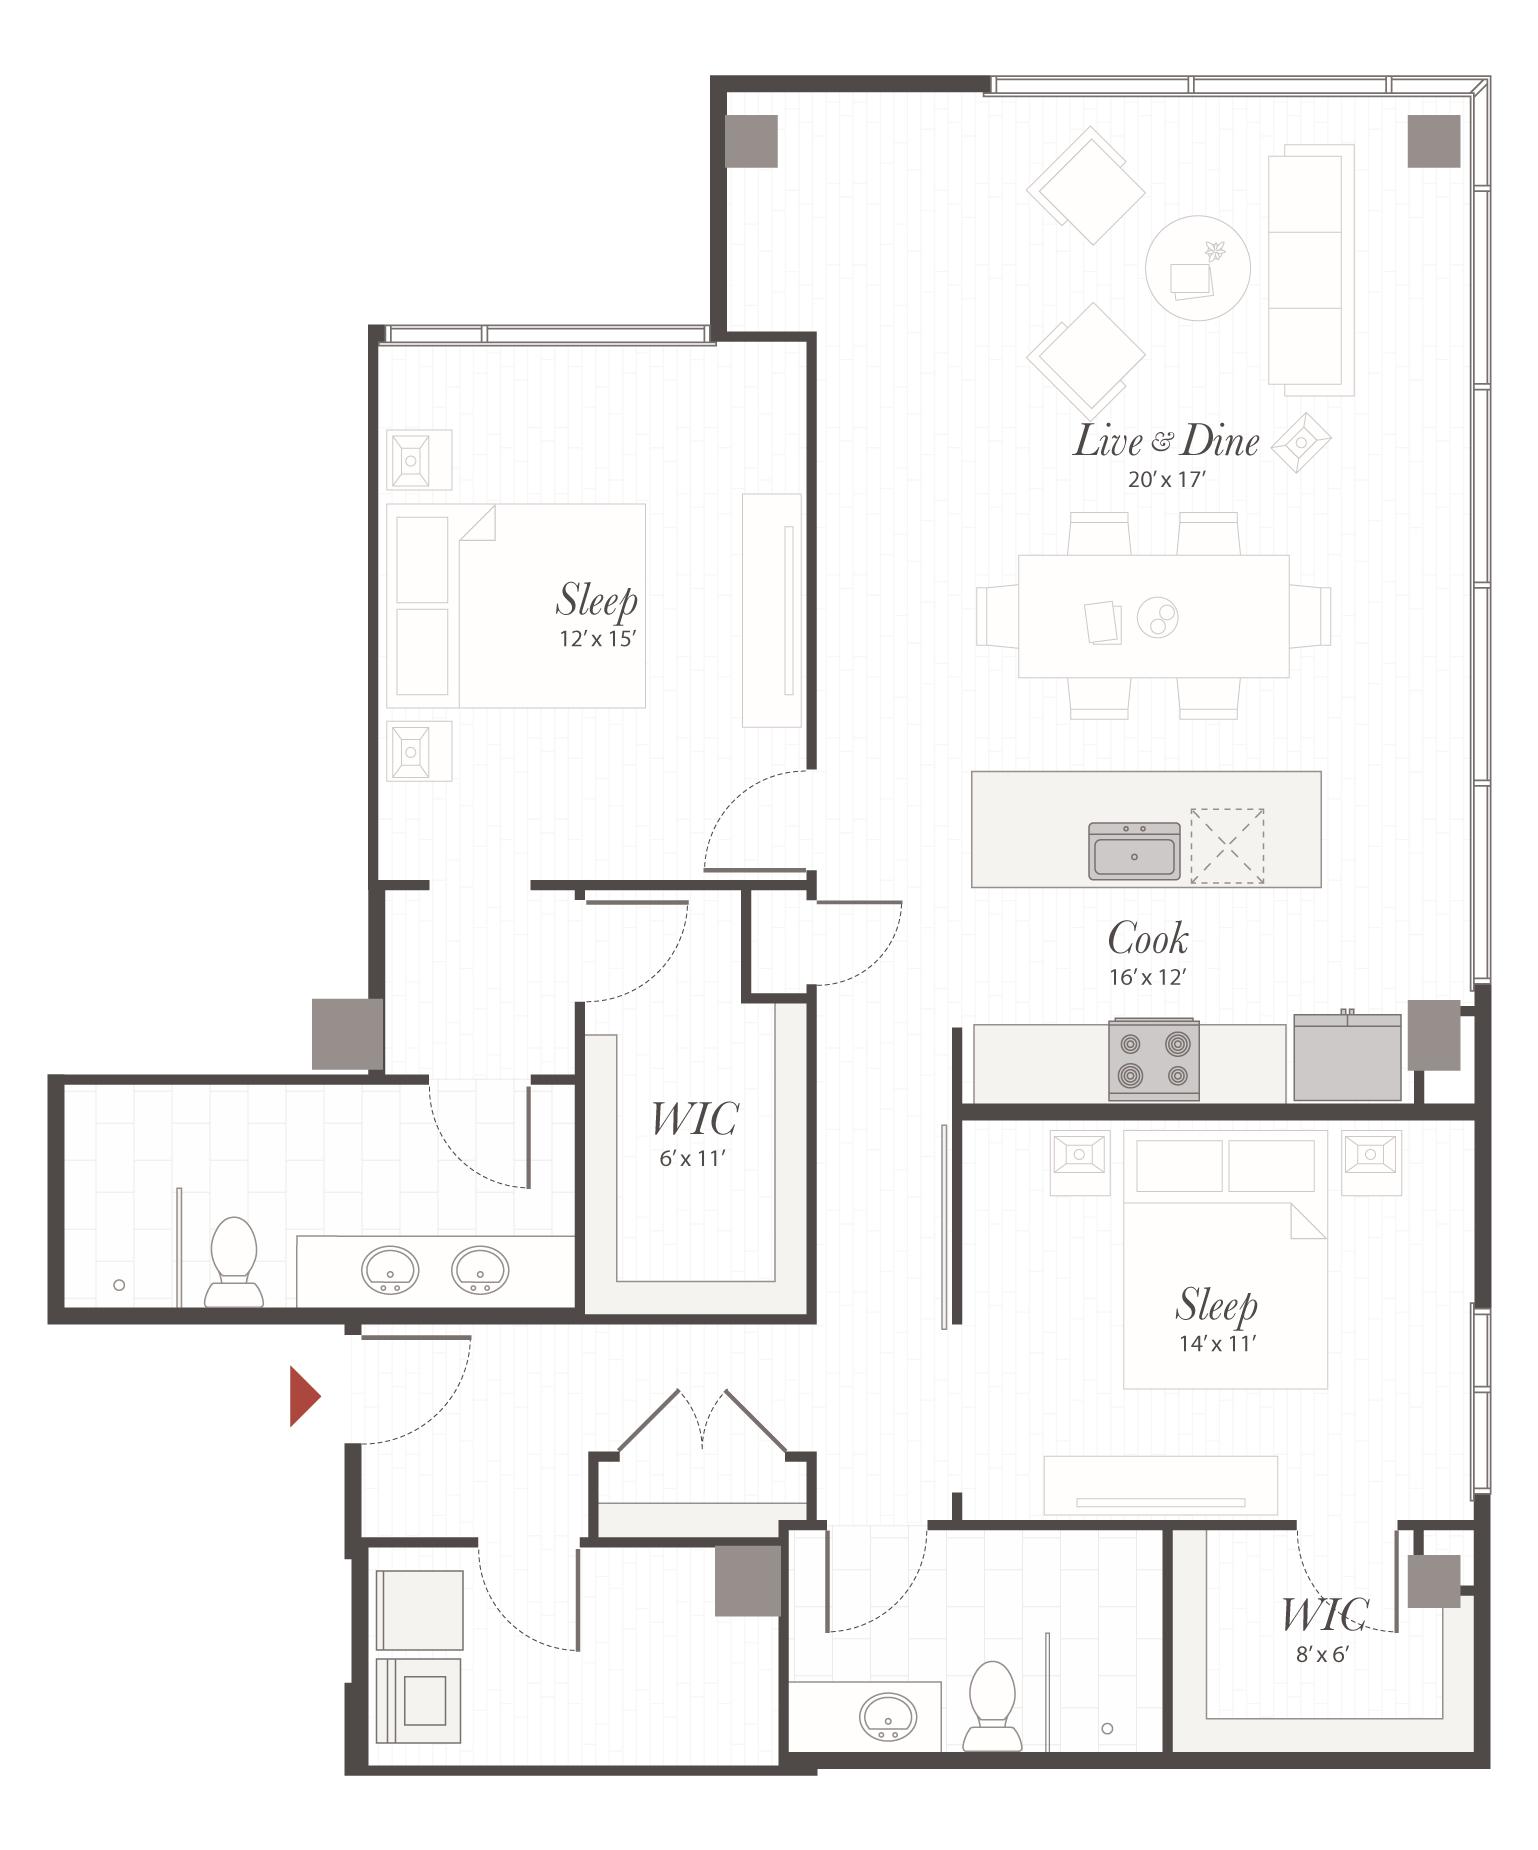 4 Bedroom Apartment Floor Plans: P4 - 2 Bedroom Apartment Cincinnati